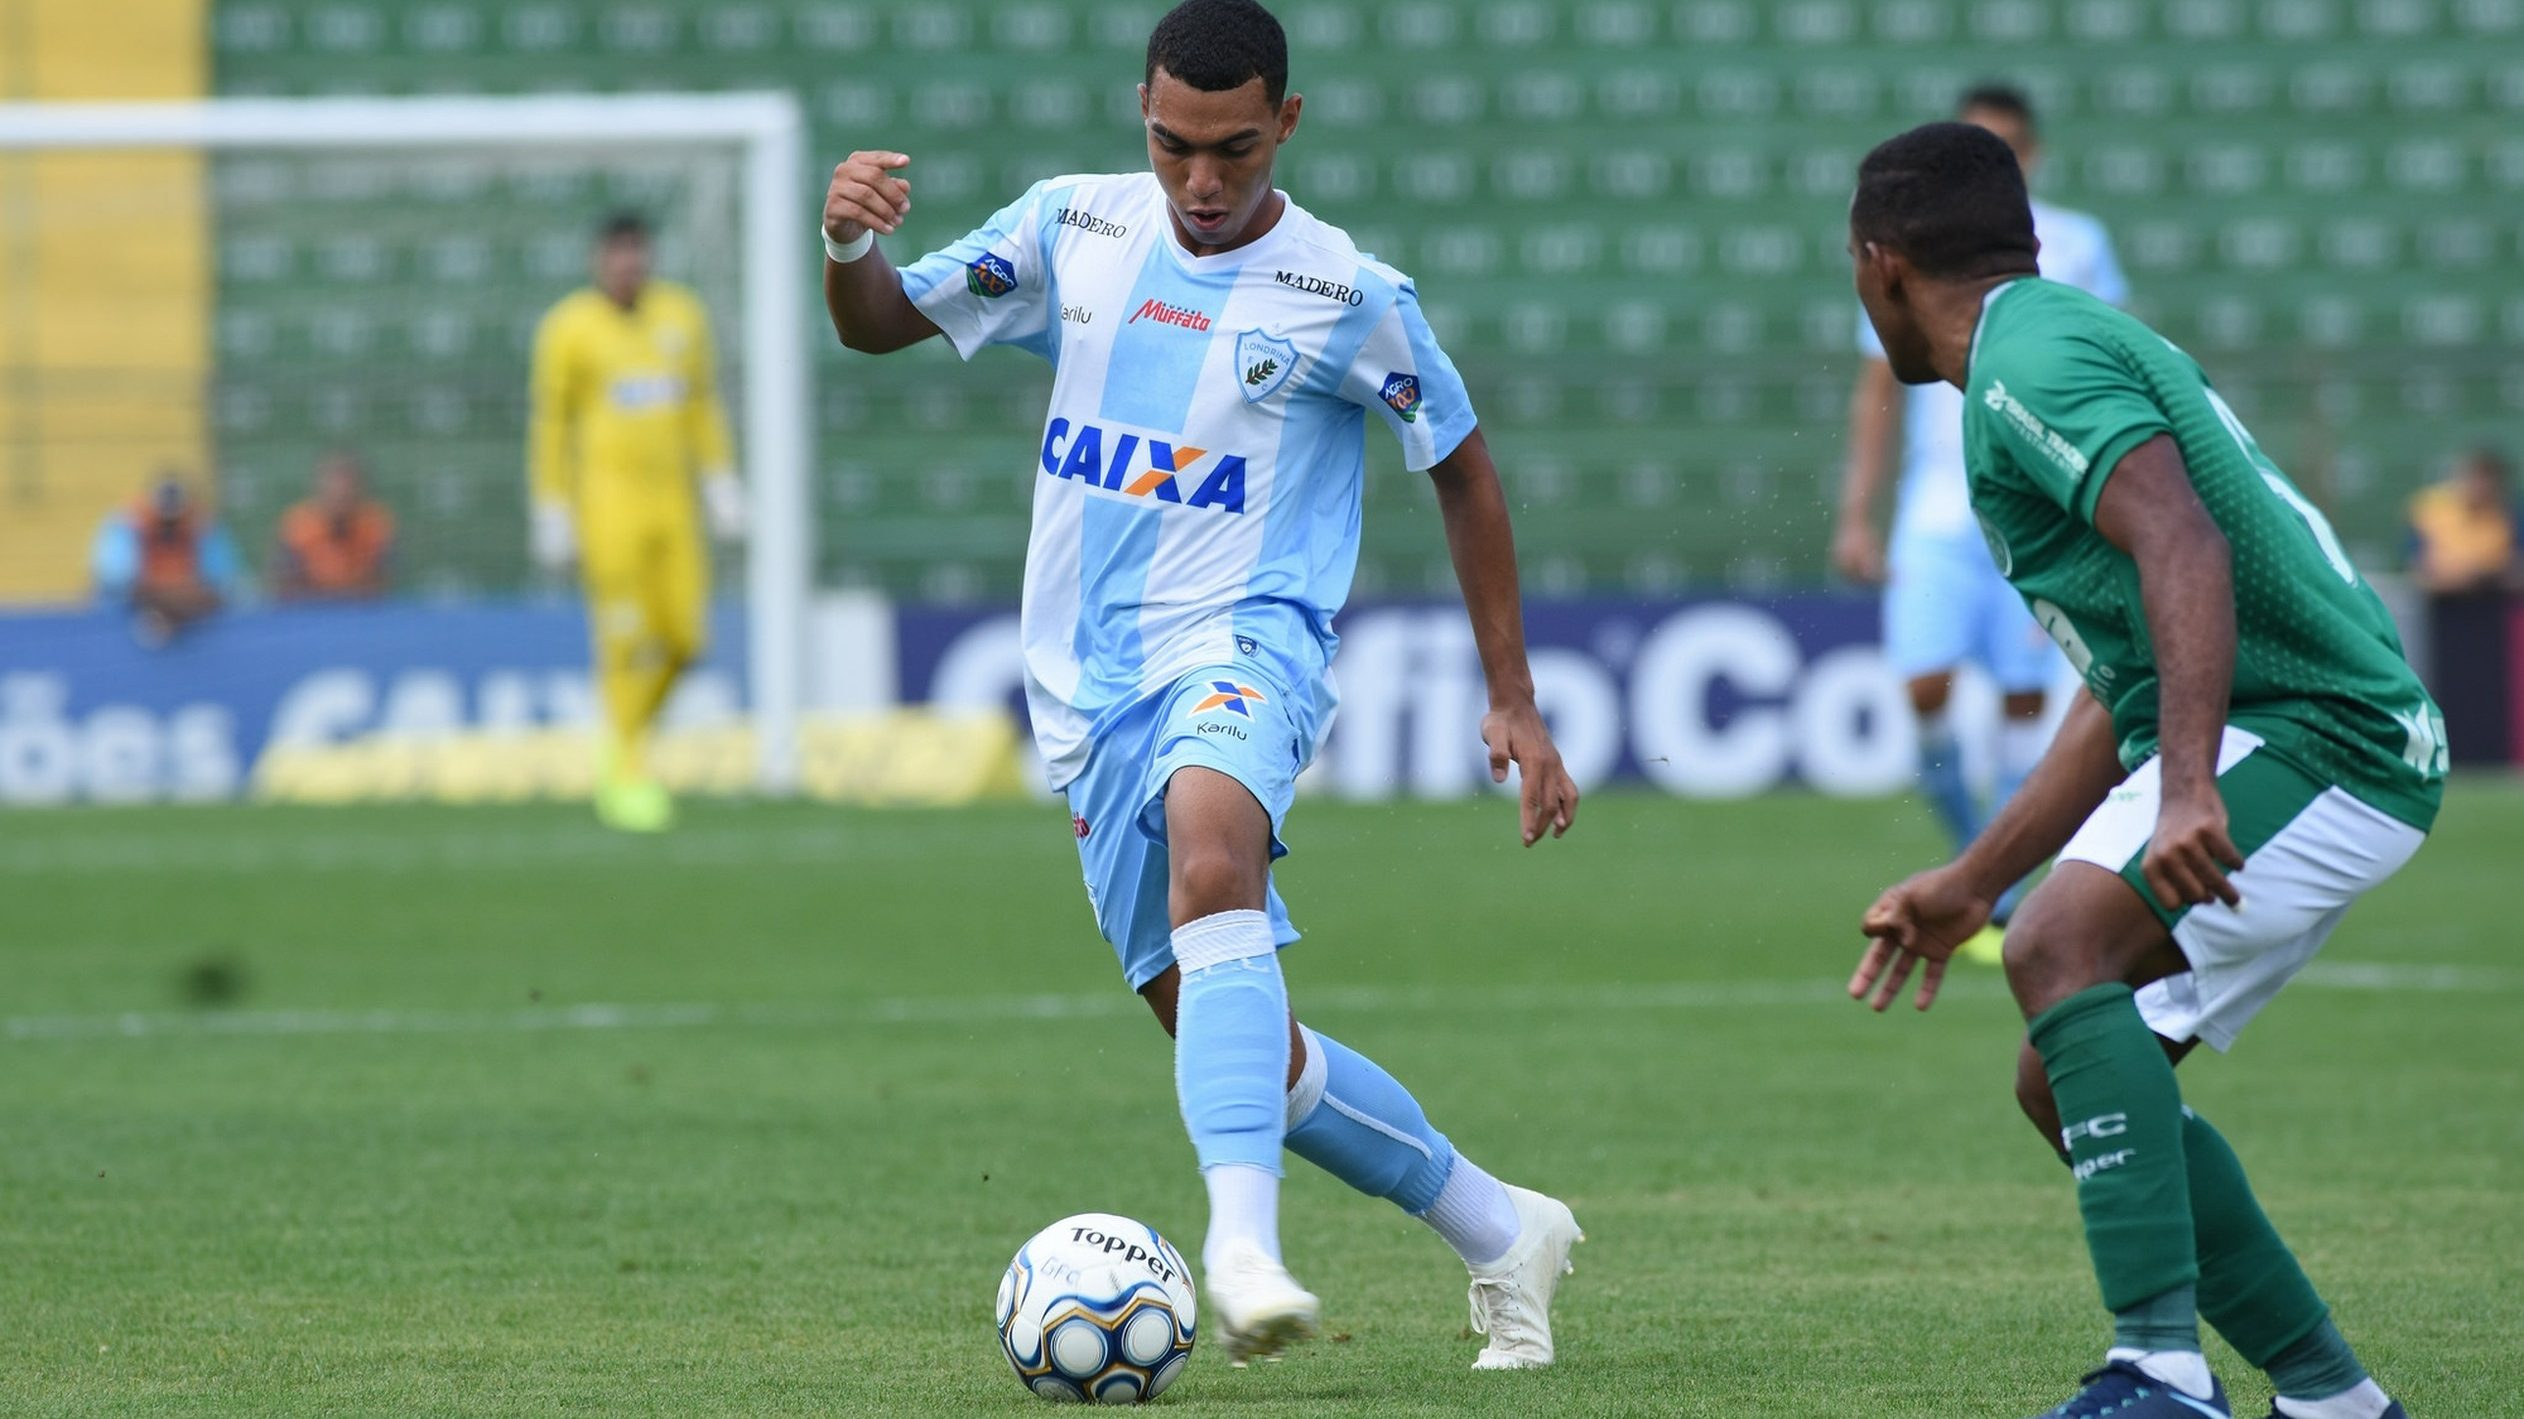 d0c557515a Gustavo Oliveira Londrina Esporte Clube - Onefootball Brasil